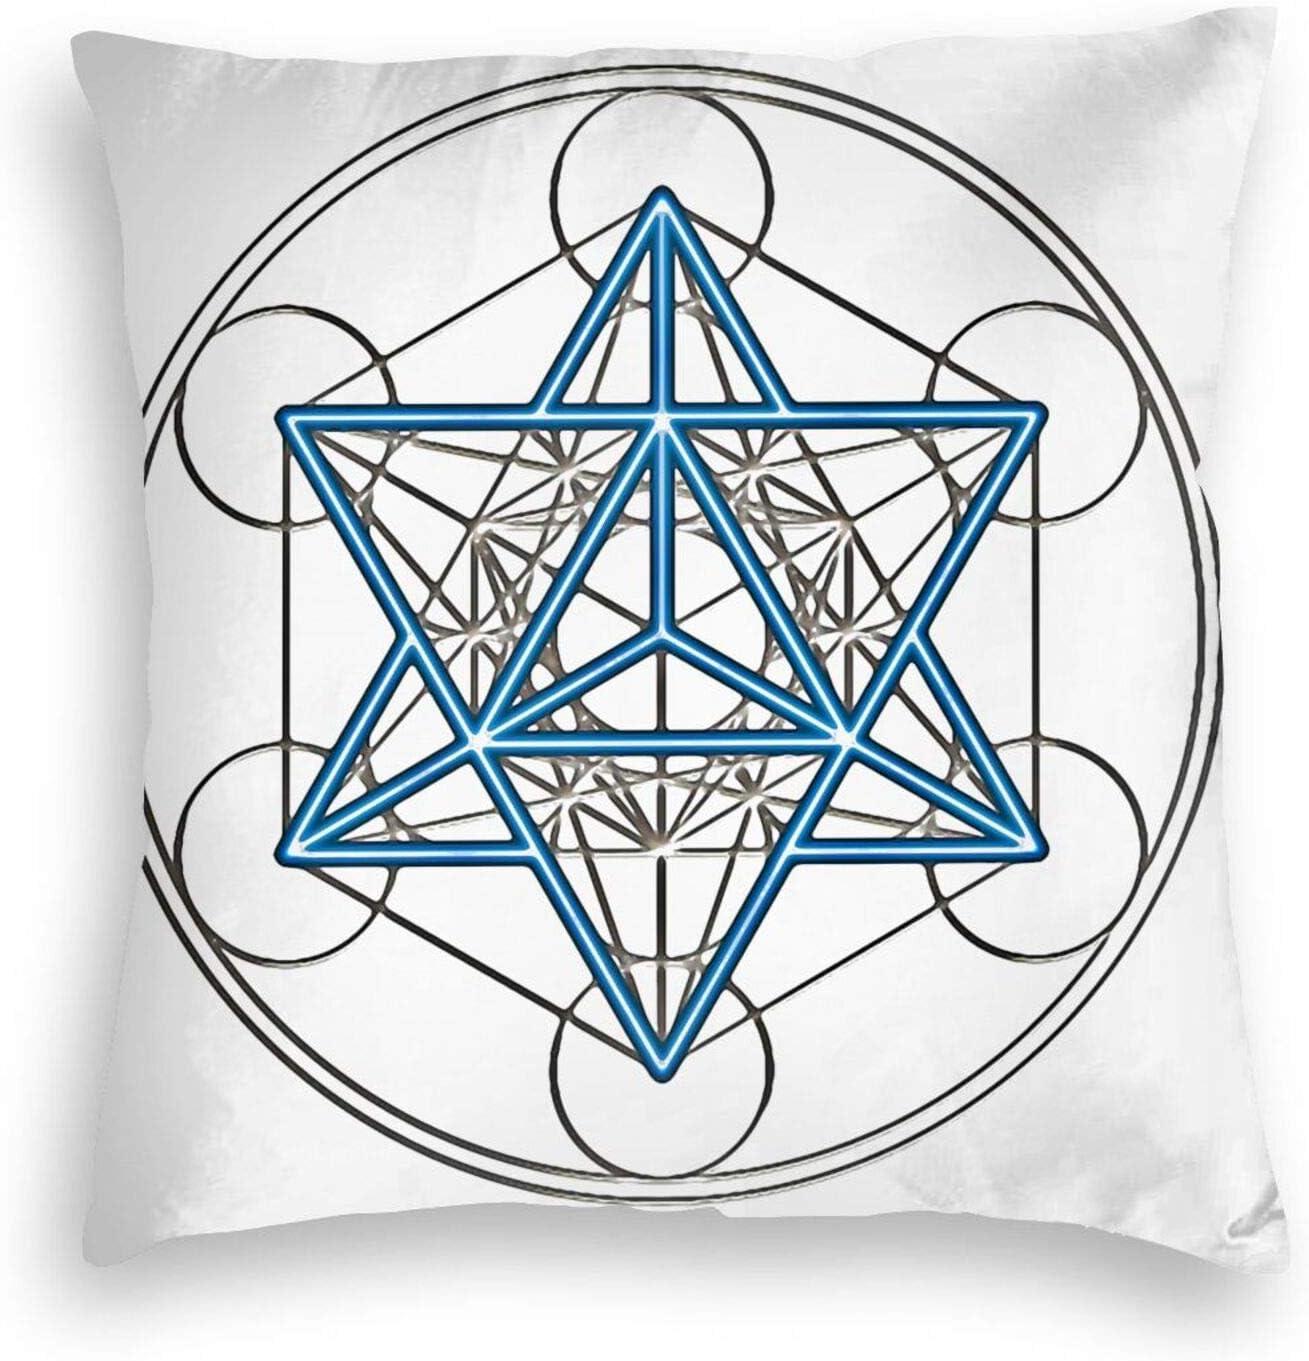 MHHYY Sacred Geometry, Star Tetrahedron Velvet Pillowcase Soft Solid Cushion Case for Bedroom